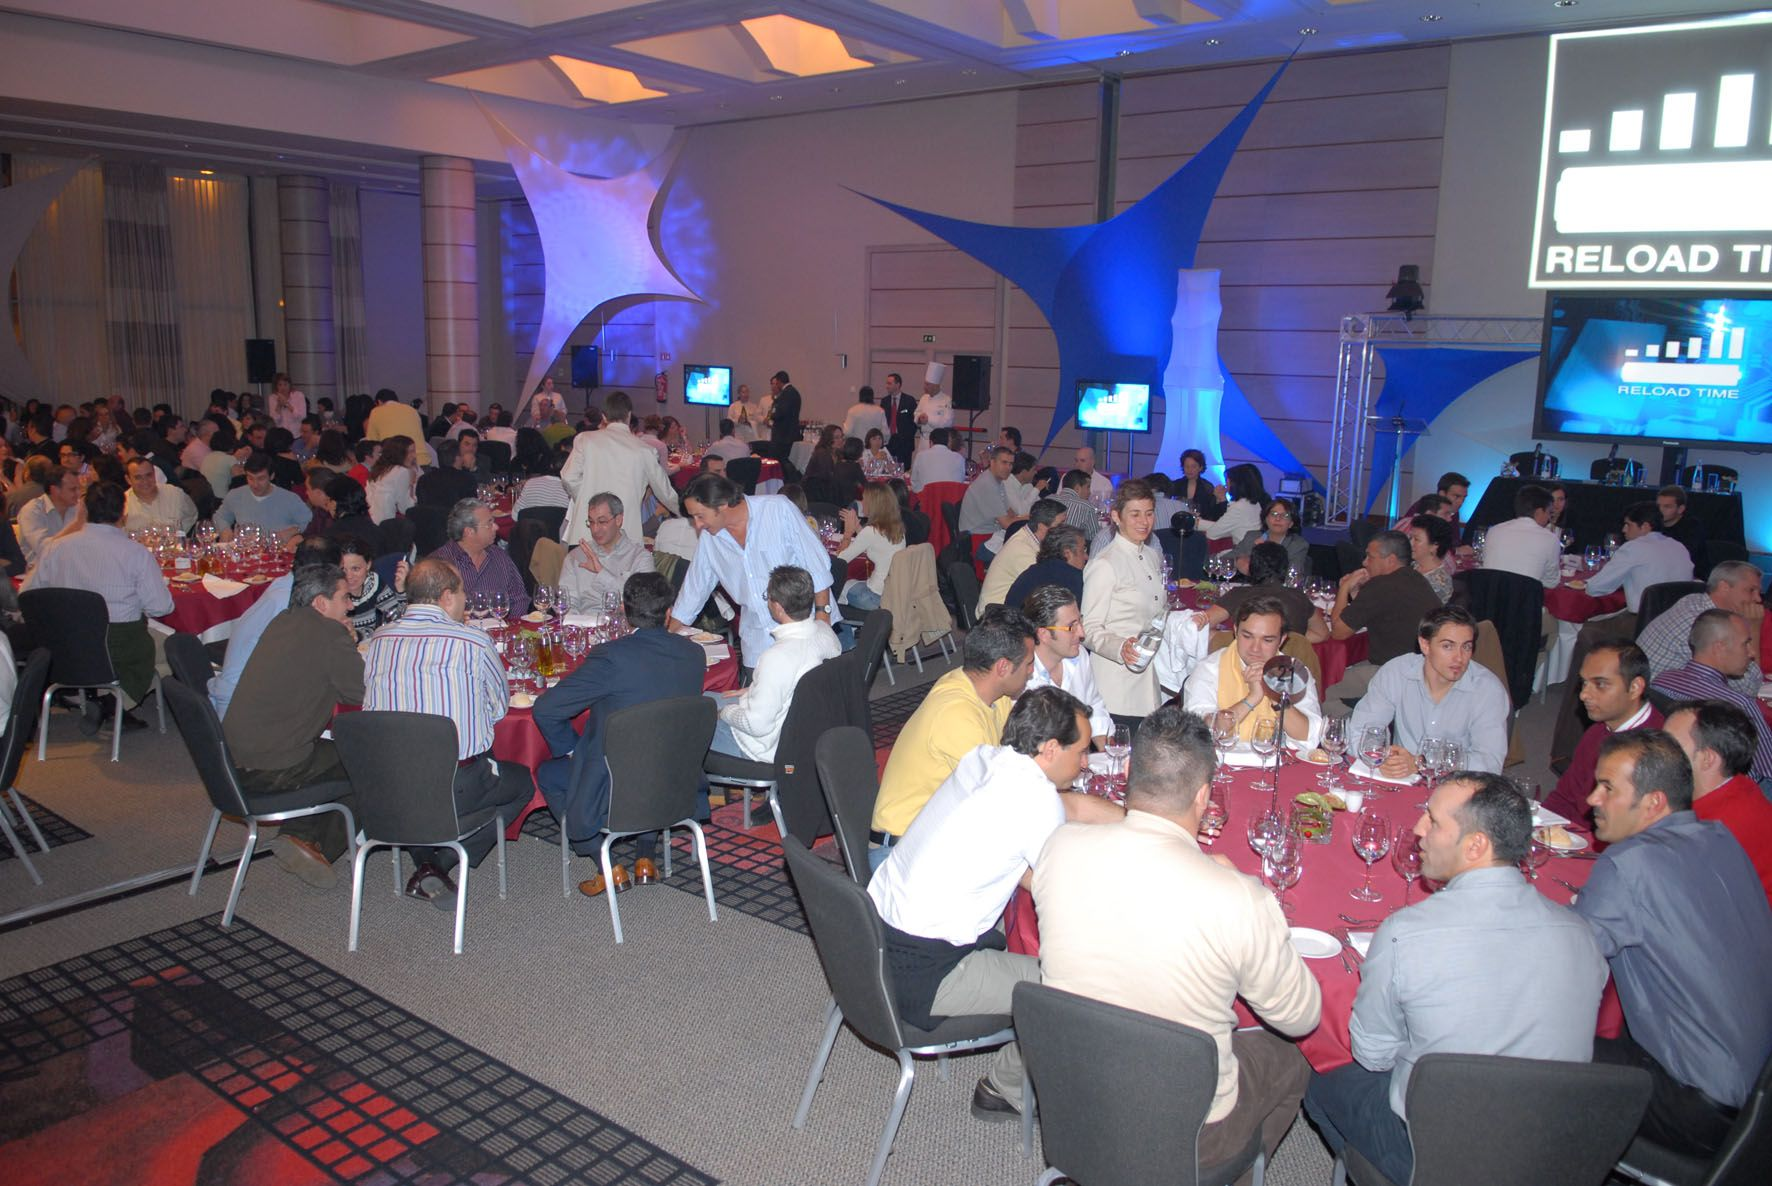 Reload Time convencion PM Valencia 2007 #reloadtime #Valencia #firstgroup #cena #Hilton